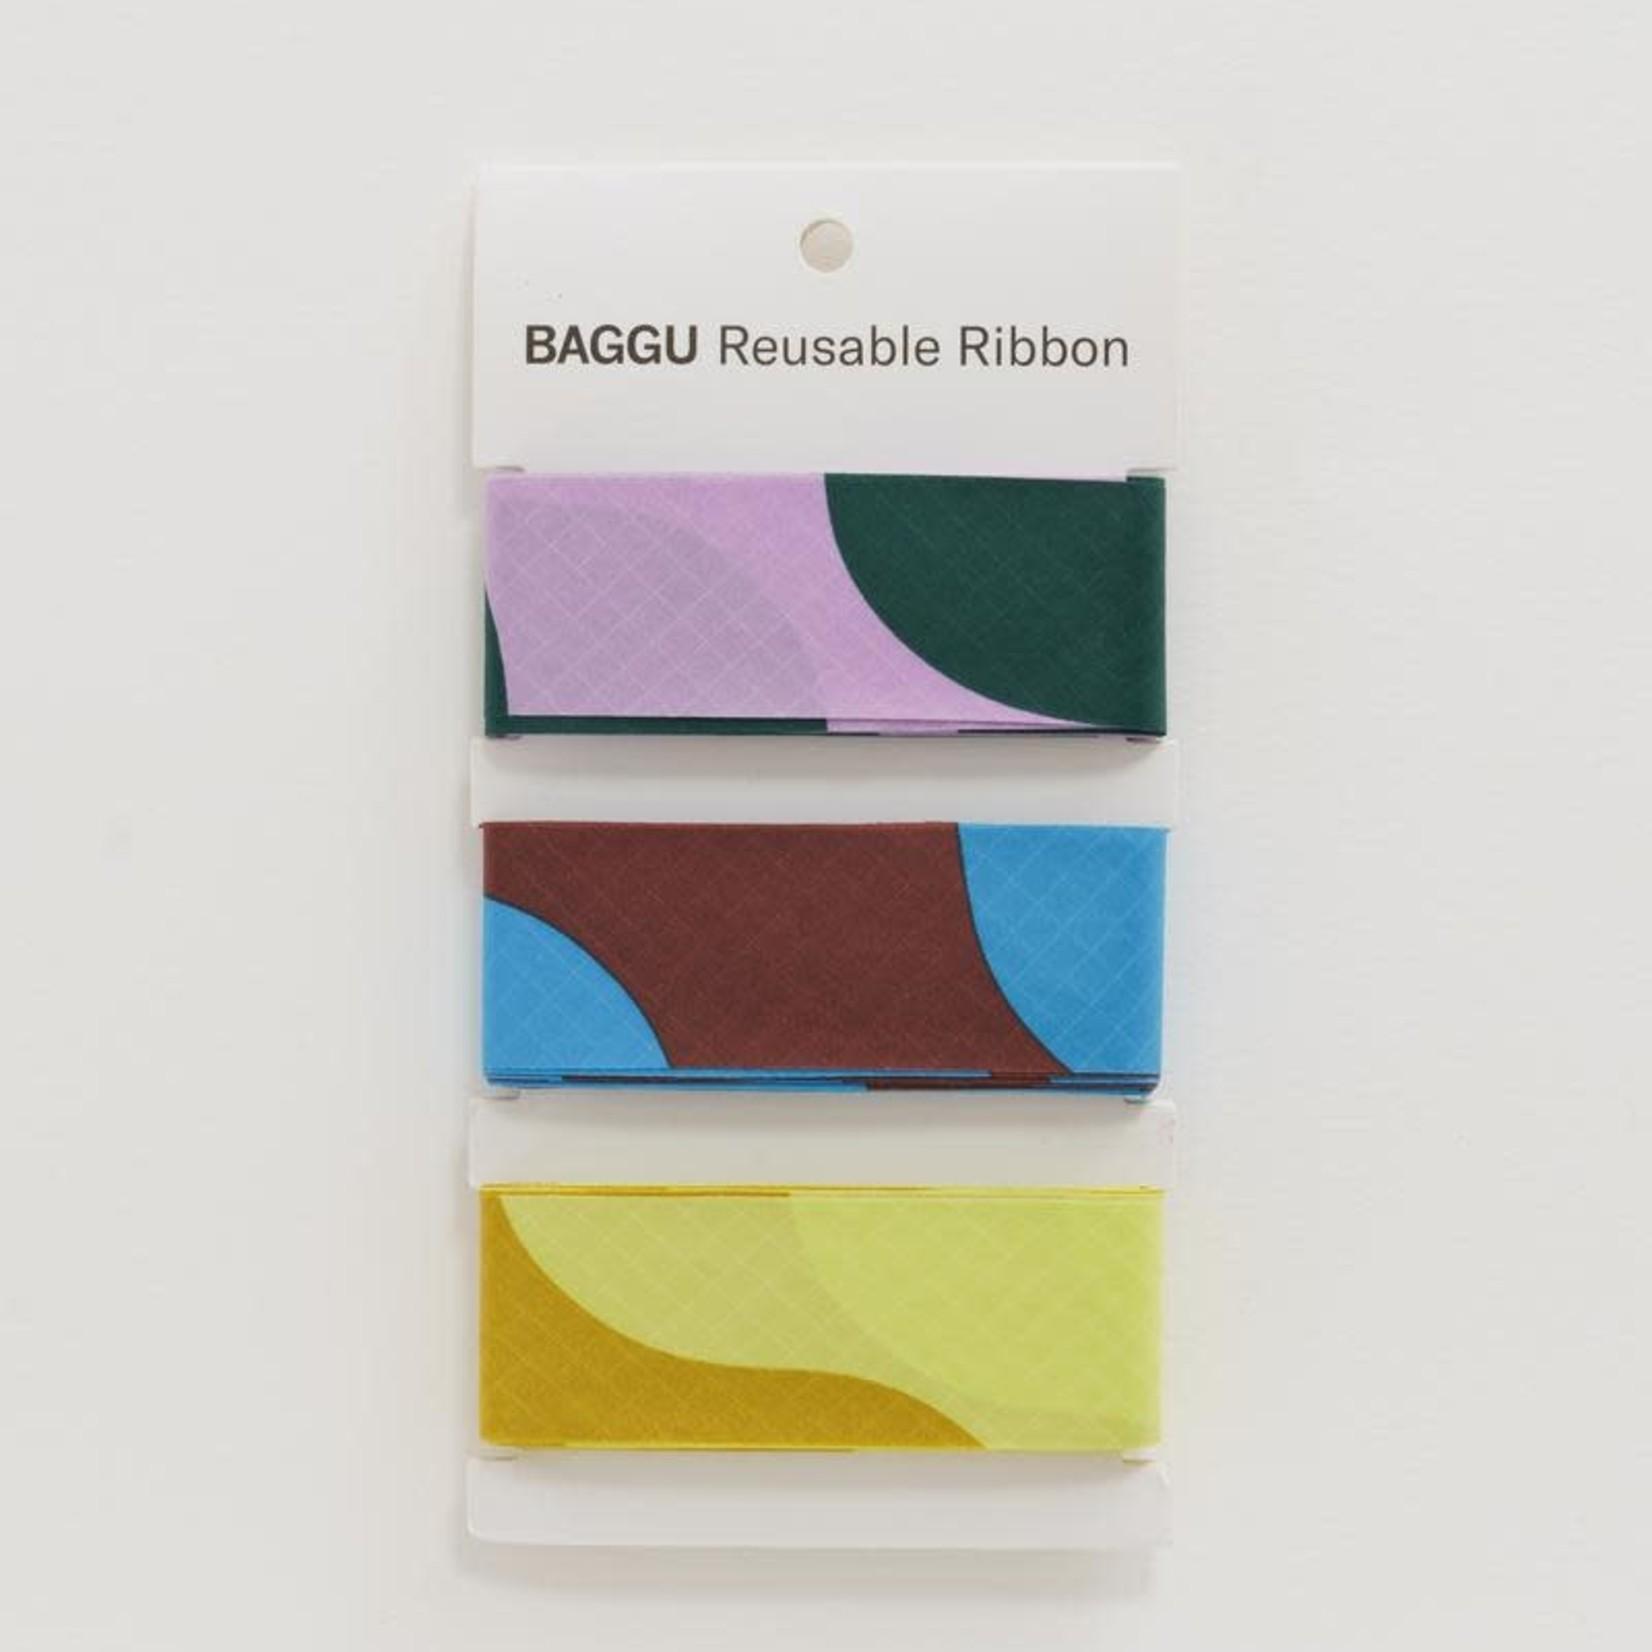 Baggu Baggu Reusable Ribbon Wavy Stripes